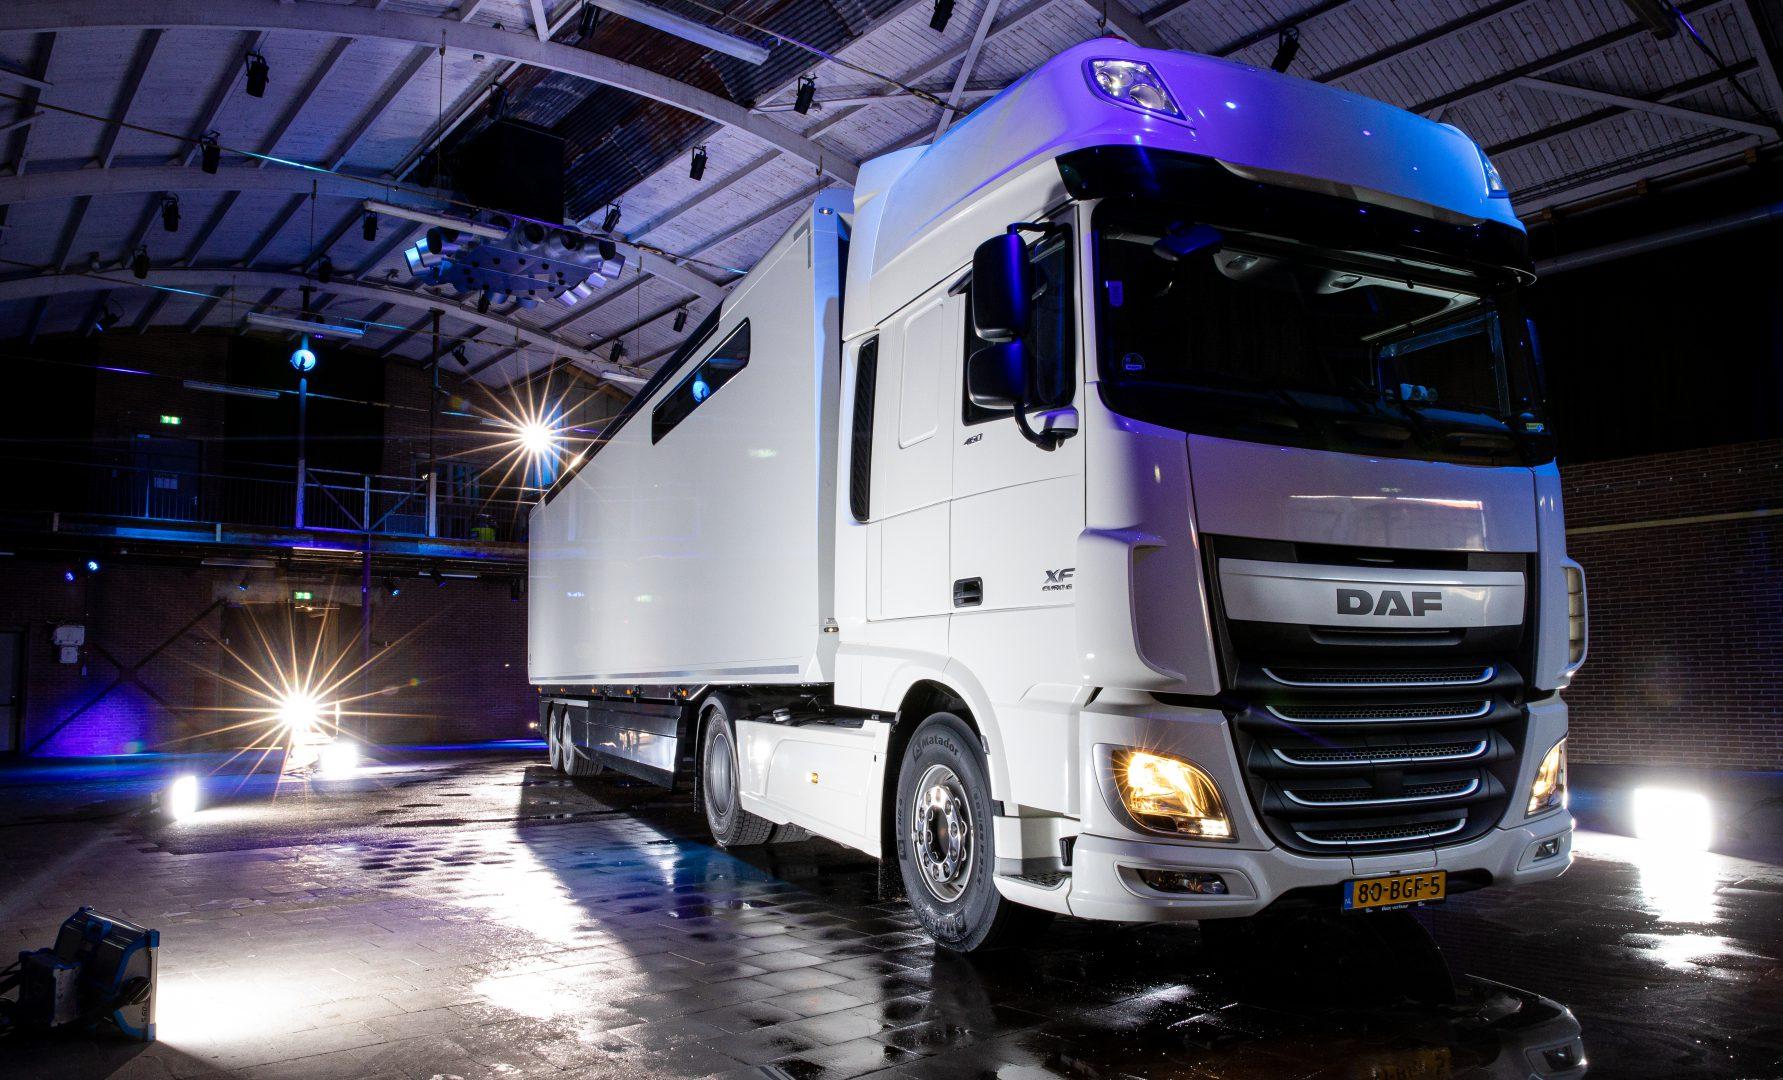 Mobiele-CT-scan-unit-cleanroom-zorg-container-ZIJLSTRA-SCHIPPER-architecten-architectenbureau-noord-holland-architect-001